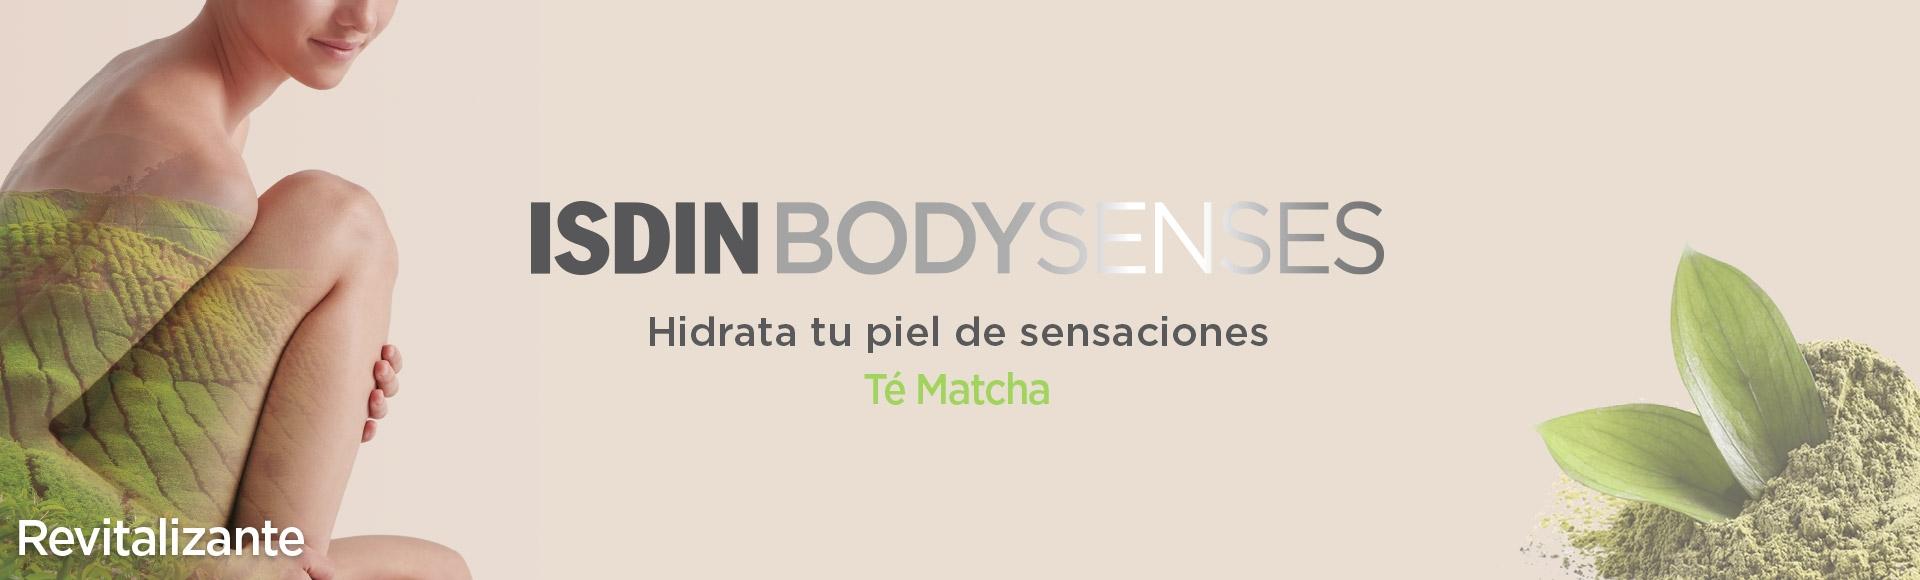 Isdin BodySenses Revitalizante Té Matcha Japonés gama de productos en Farma2go